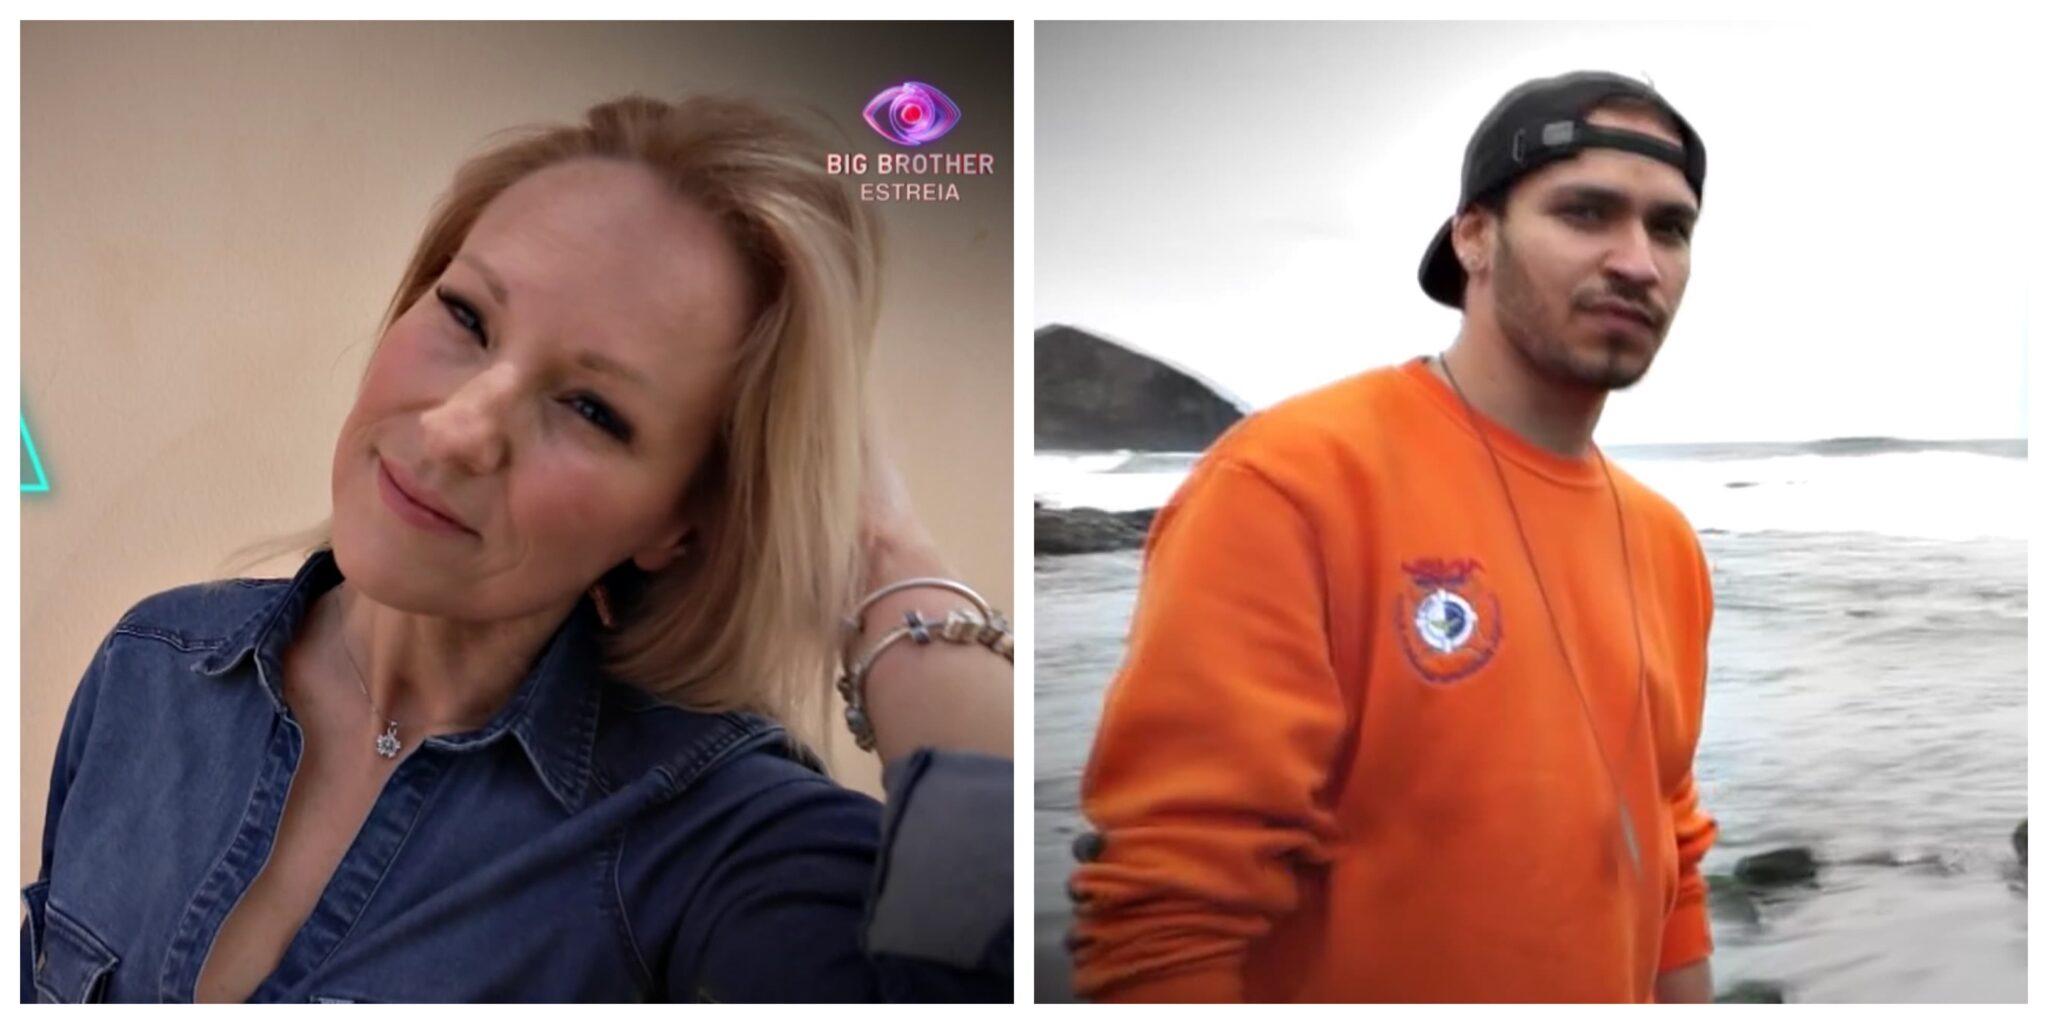 Big Brother Teresa Renato Scaled Teresa E Renato. Conheça Os Novos Concorrentes Do Big Brother 2020